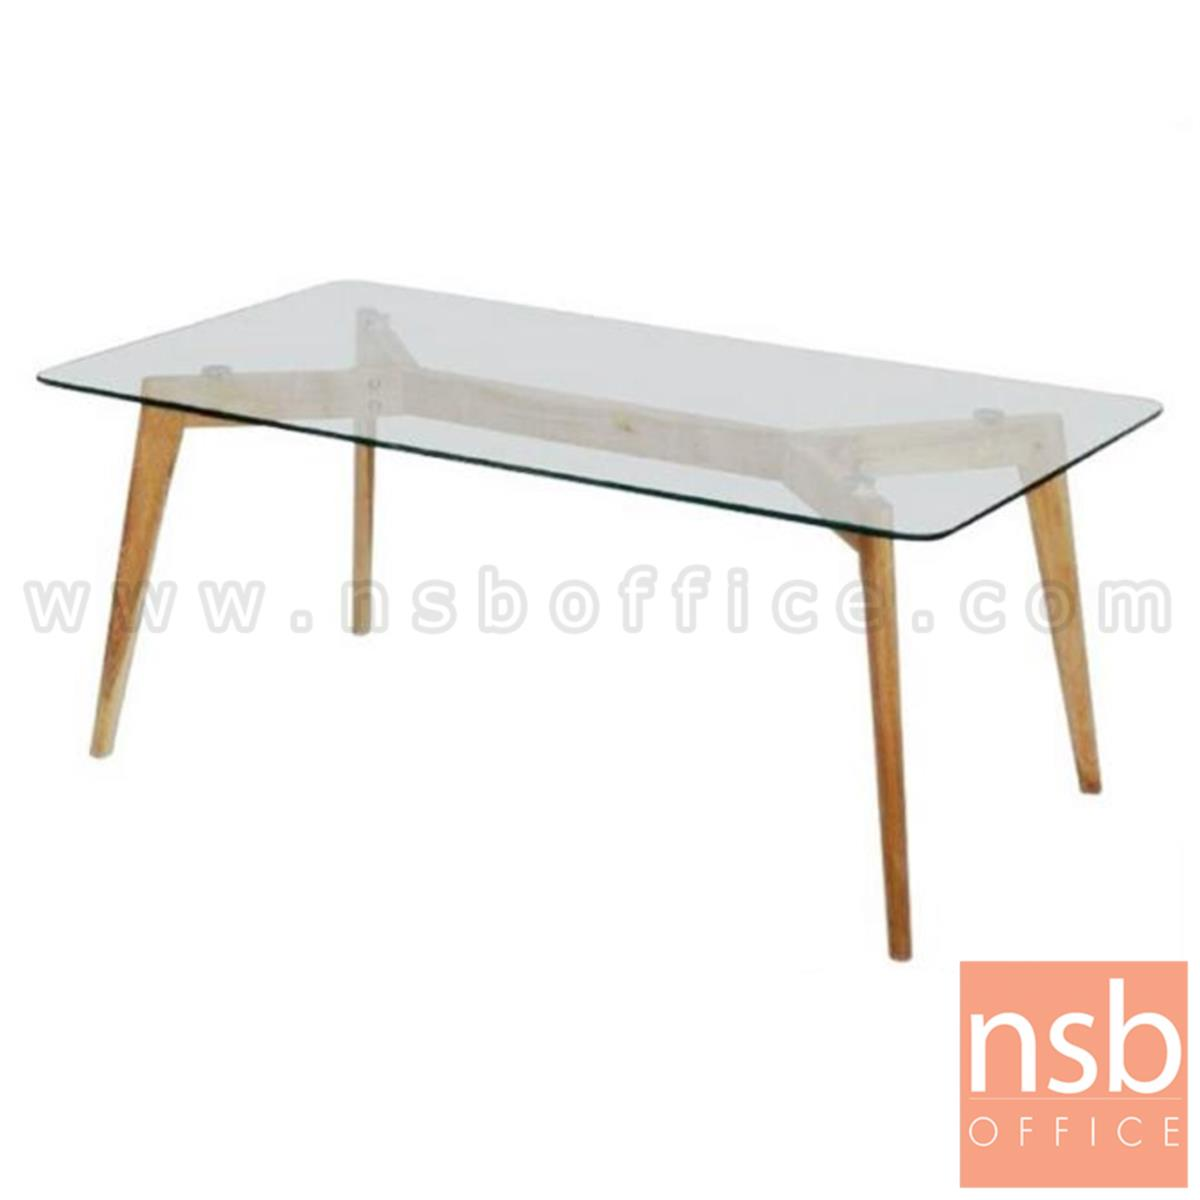 B13A179:โต๊ะกลางกระจก  รุ่น Wilson (วิลสัน) ขนาด 120W cm. ขาไม้